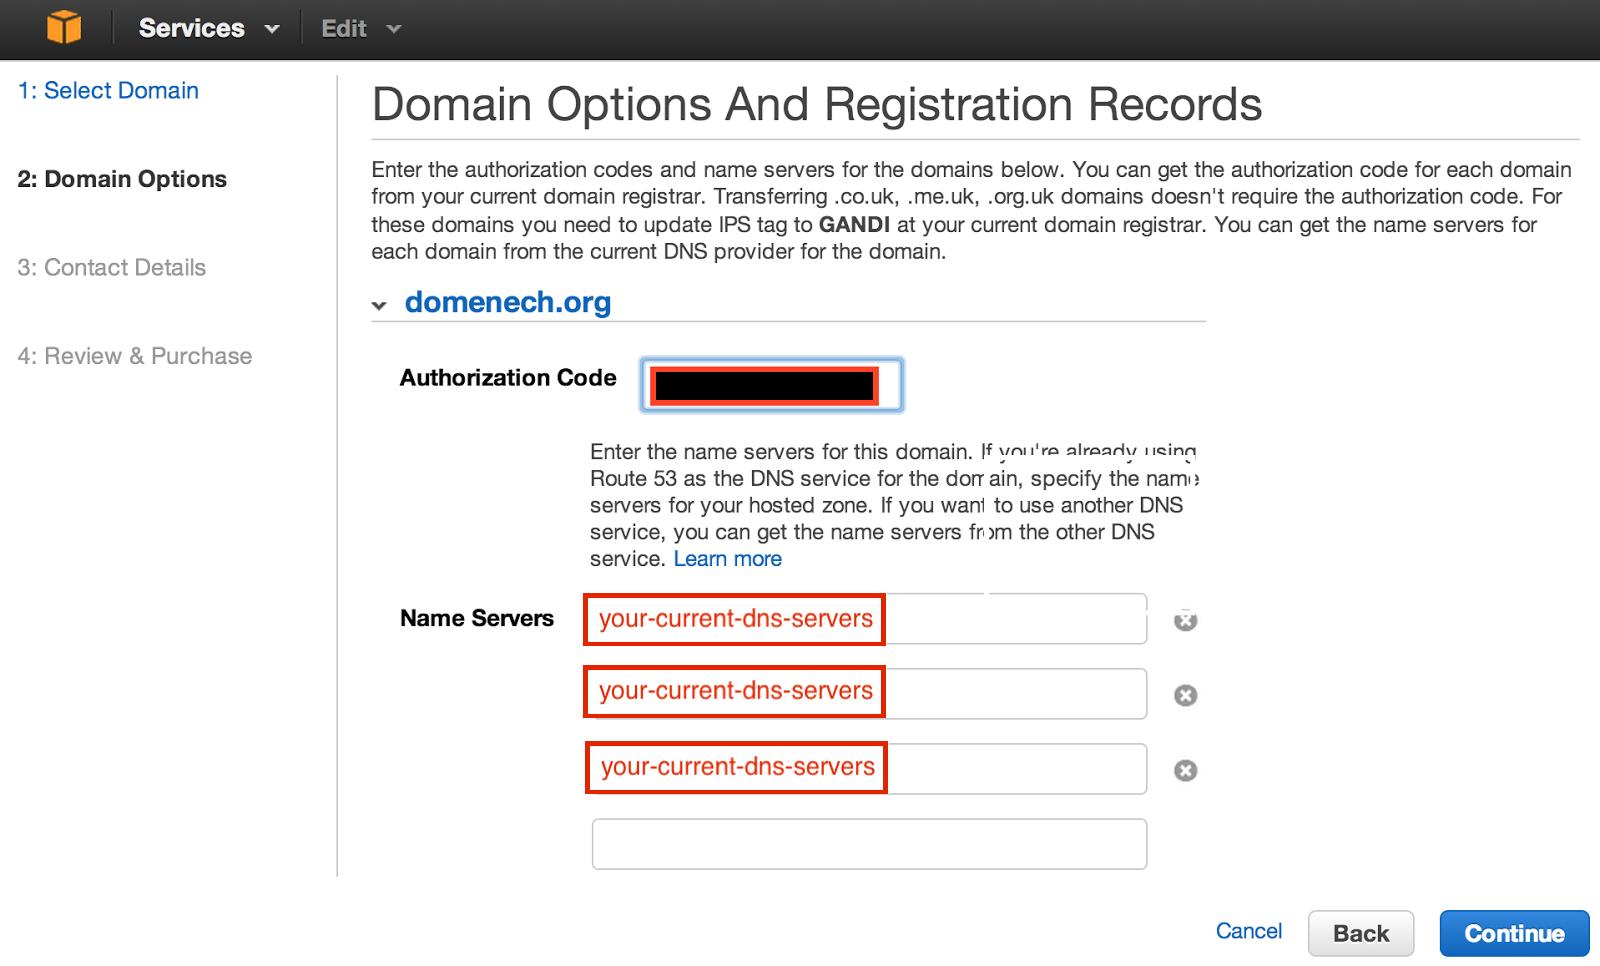 blog-domenech-org-transfer-internet-domain-to-aws-route-53-step-4